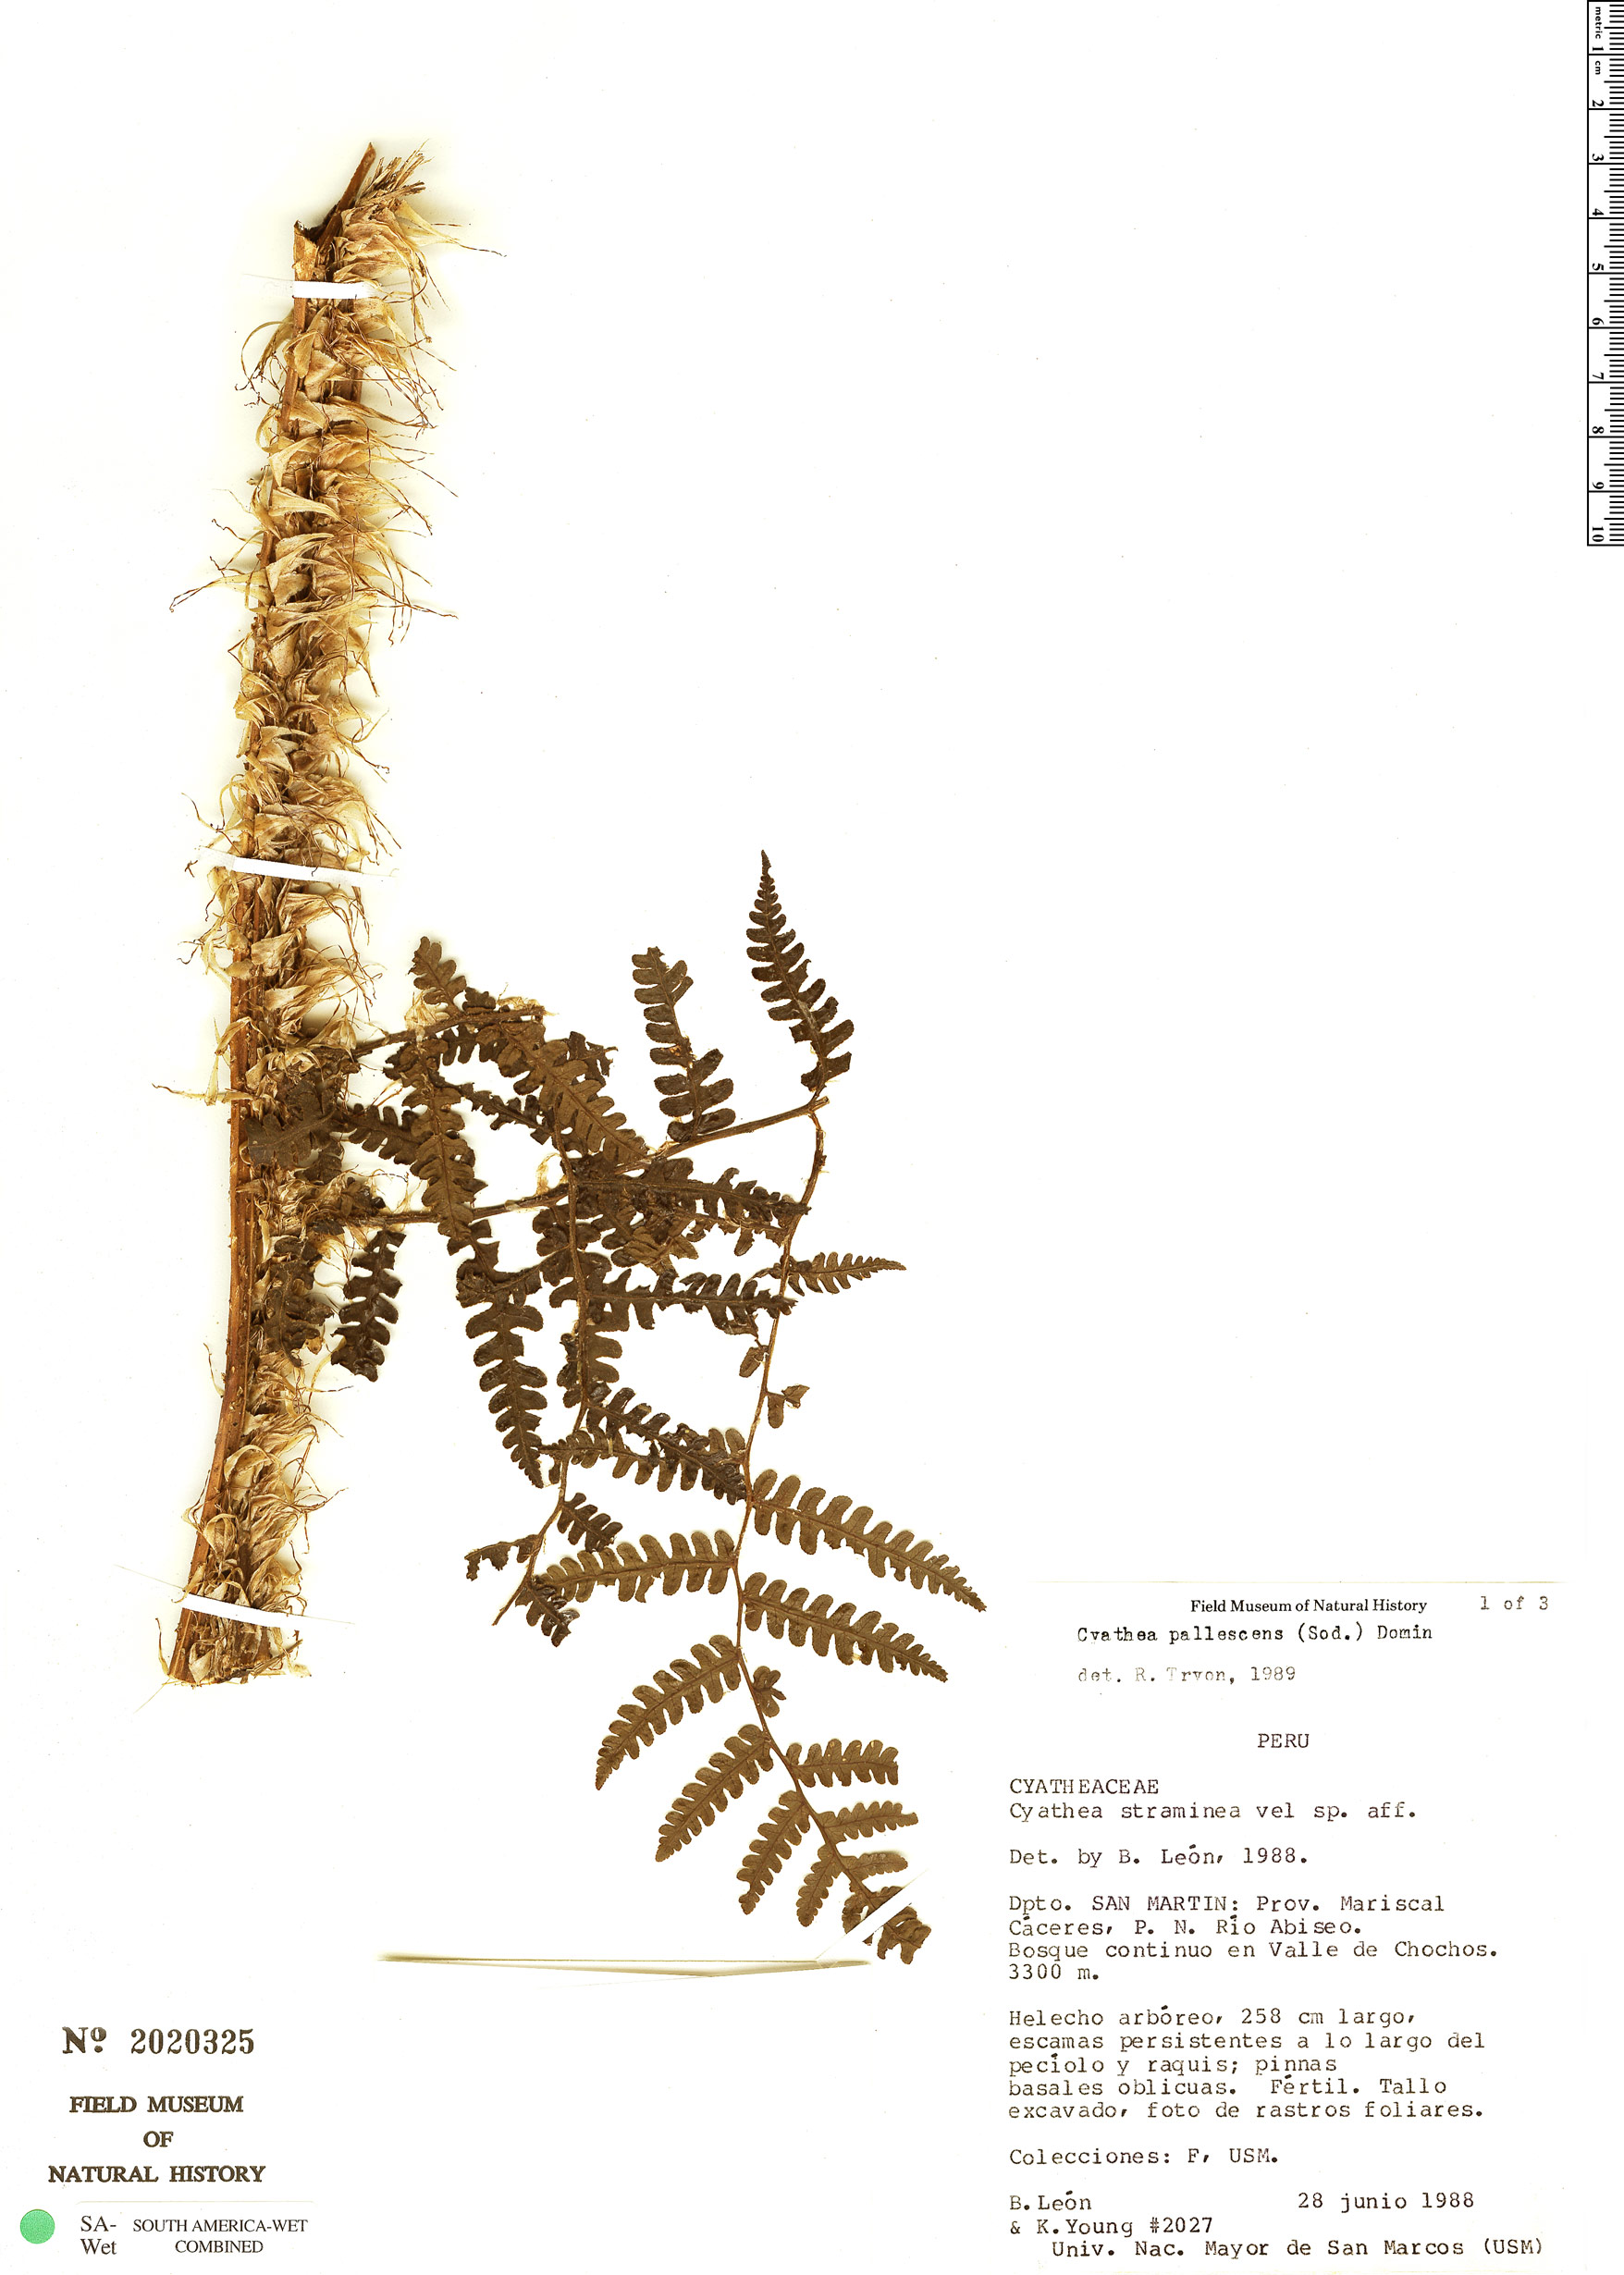 Specimen: Cyathea straminea